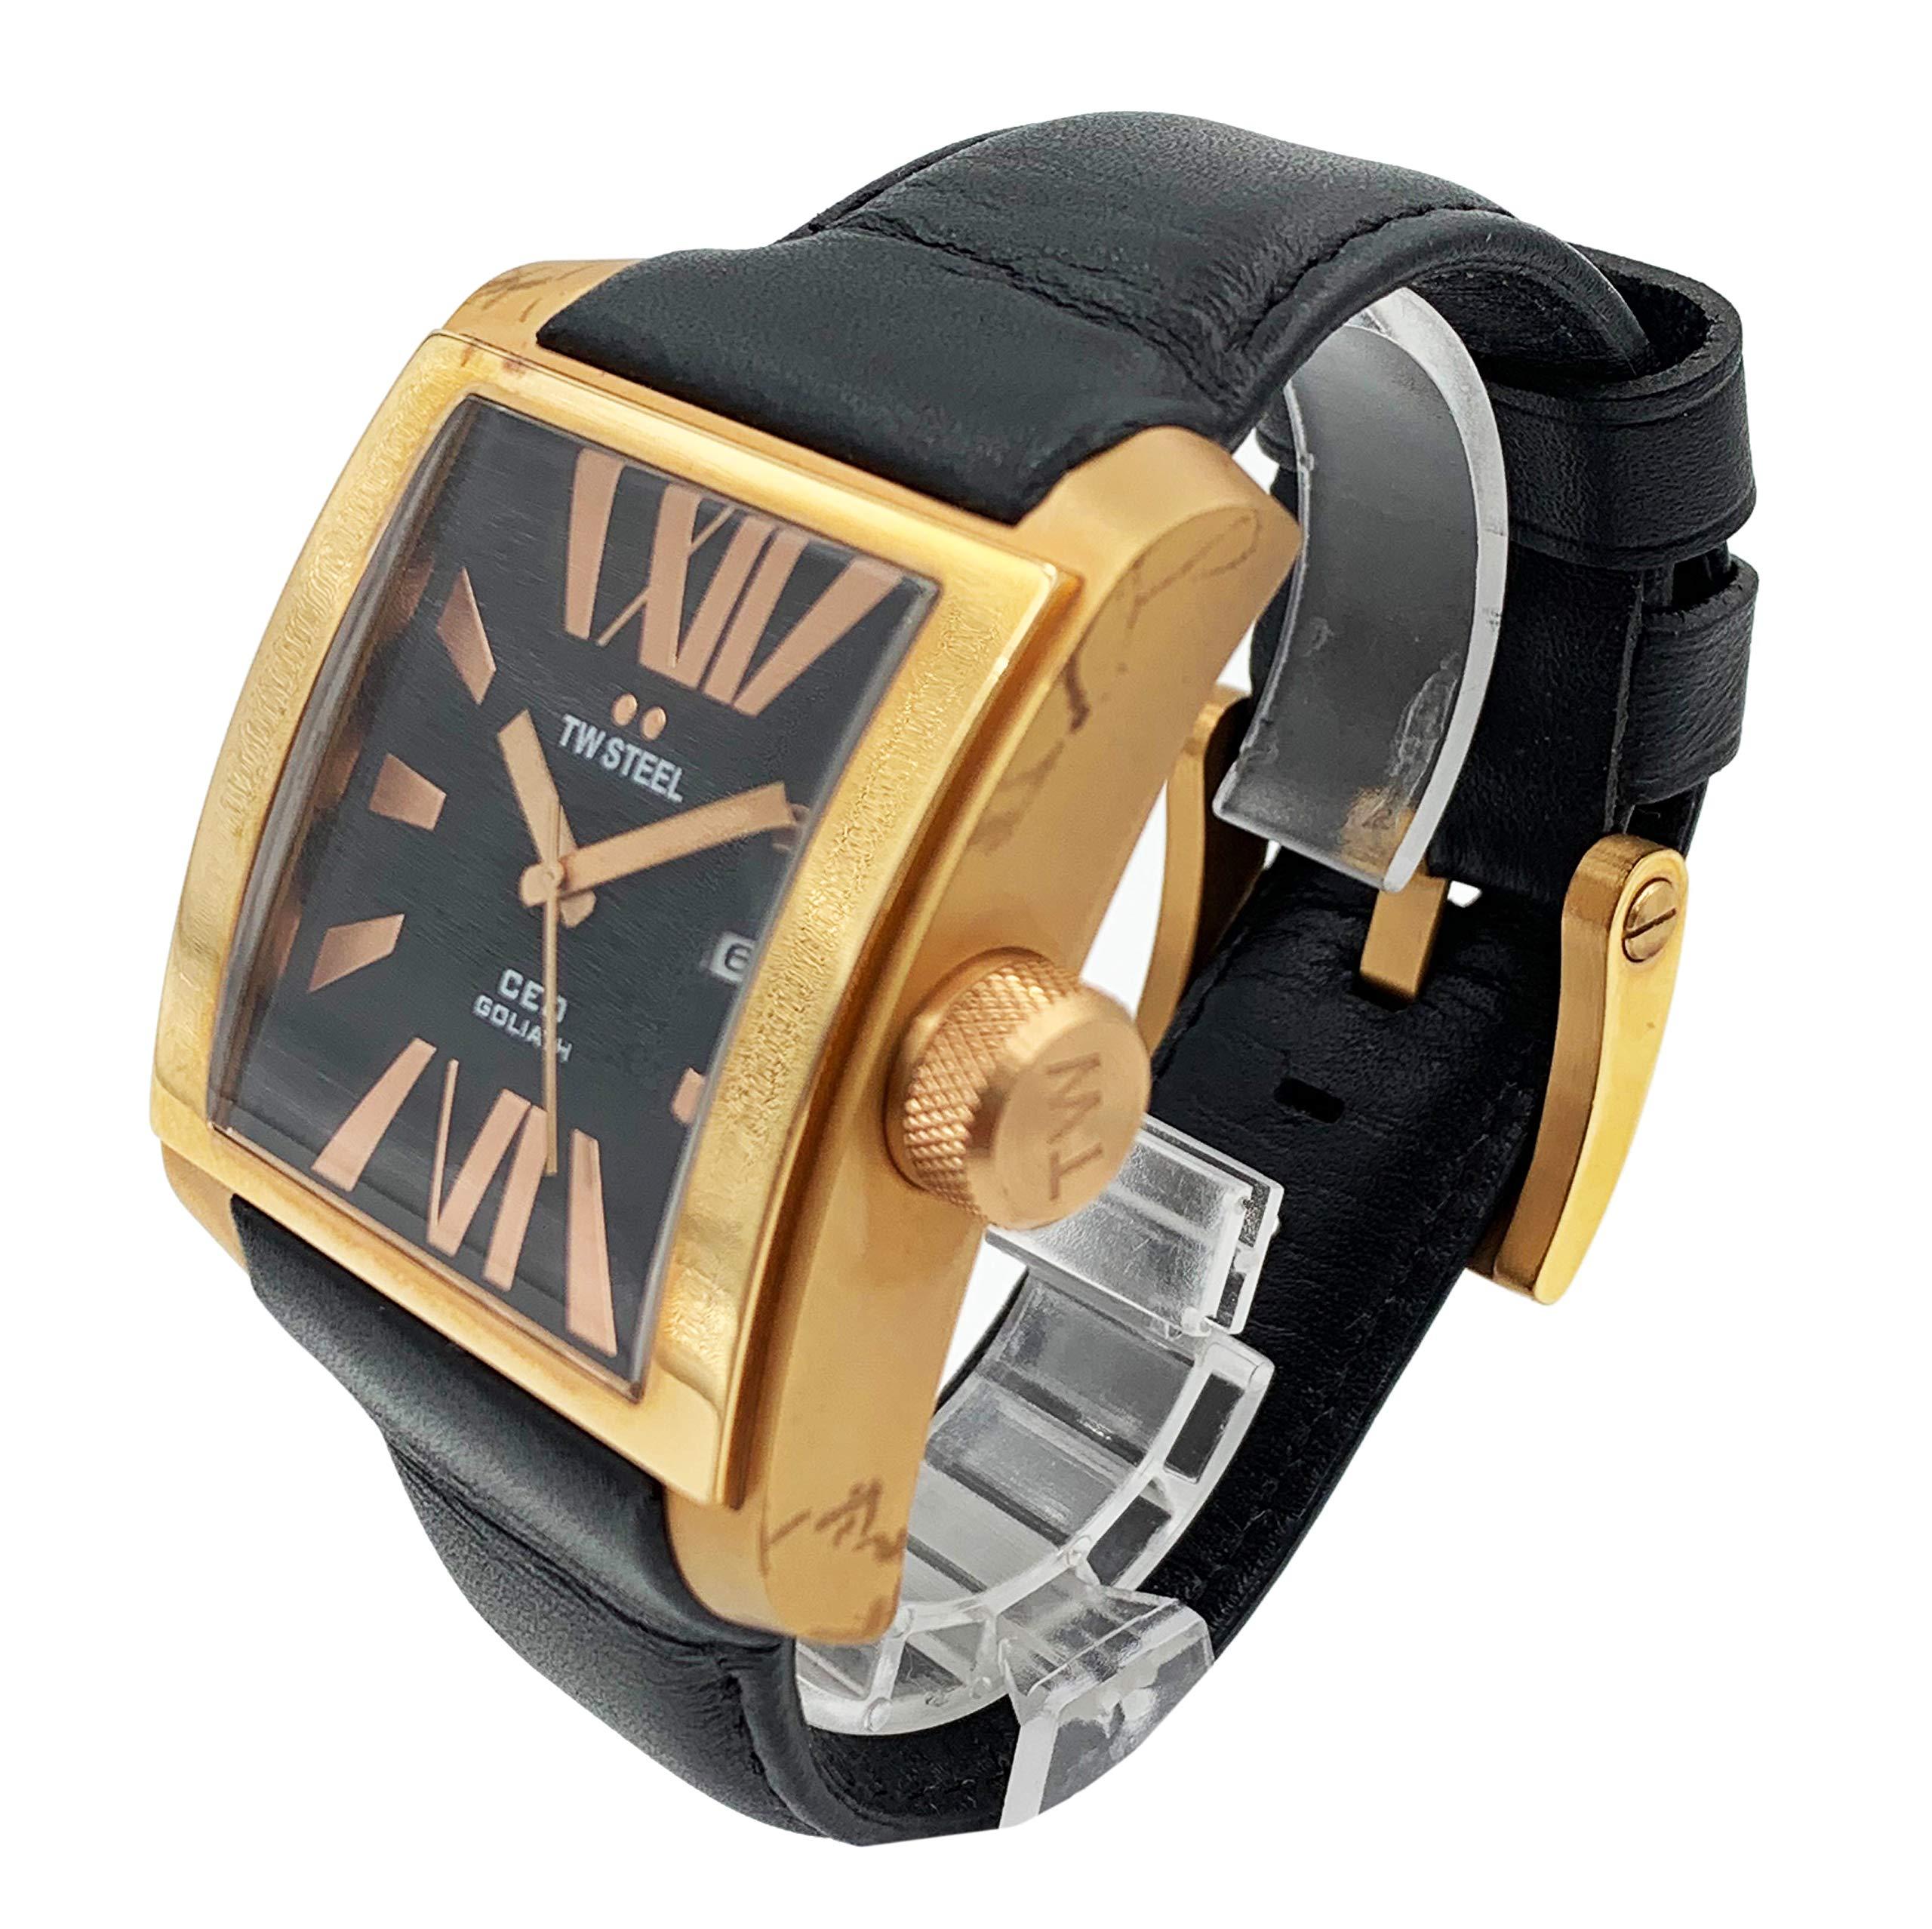 TW Steel CEO Quartz Male Watch CE3011 (Certified Pre-Owned) by TW Steel (Image #3)